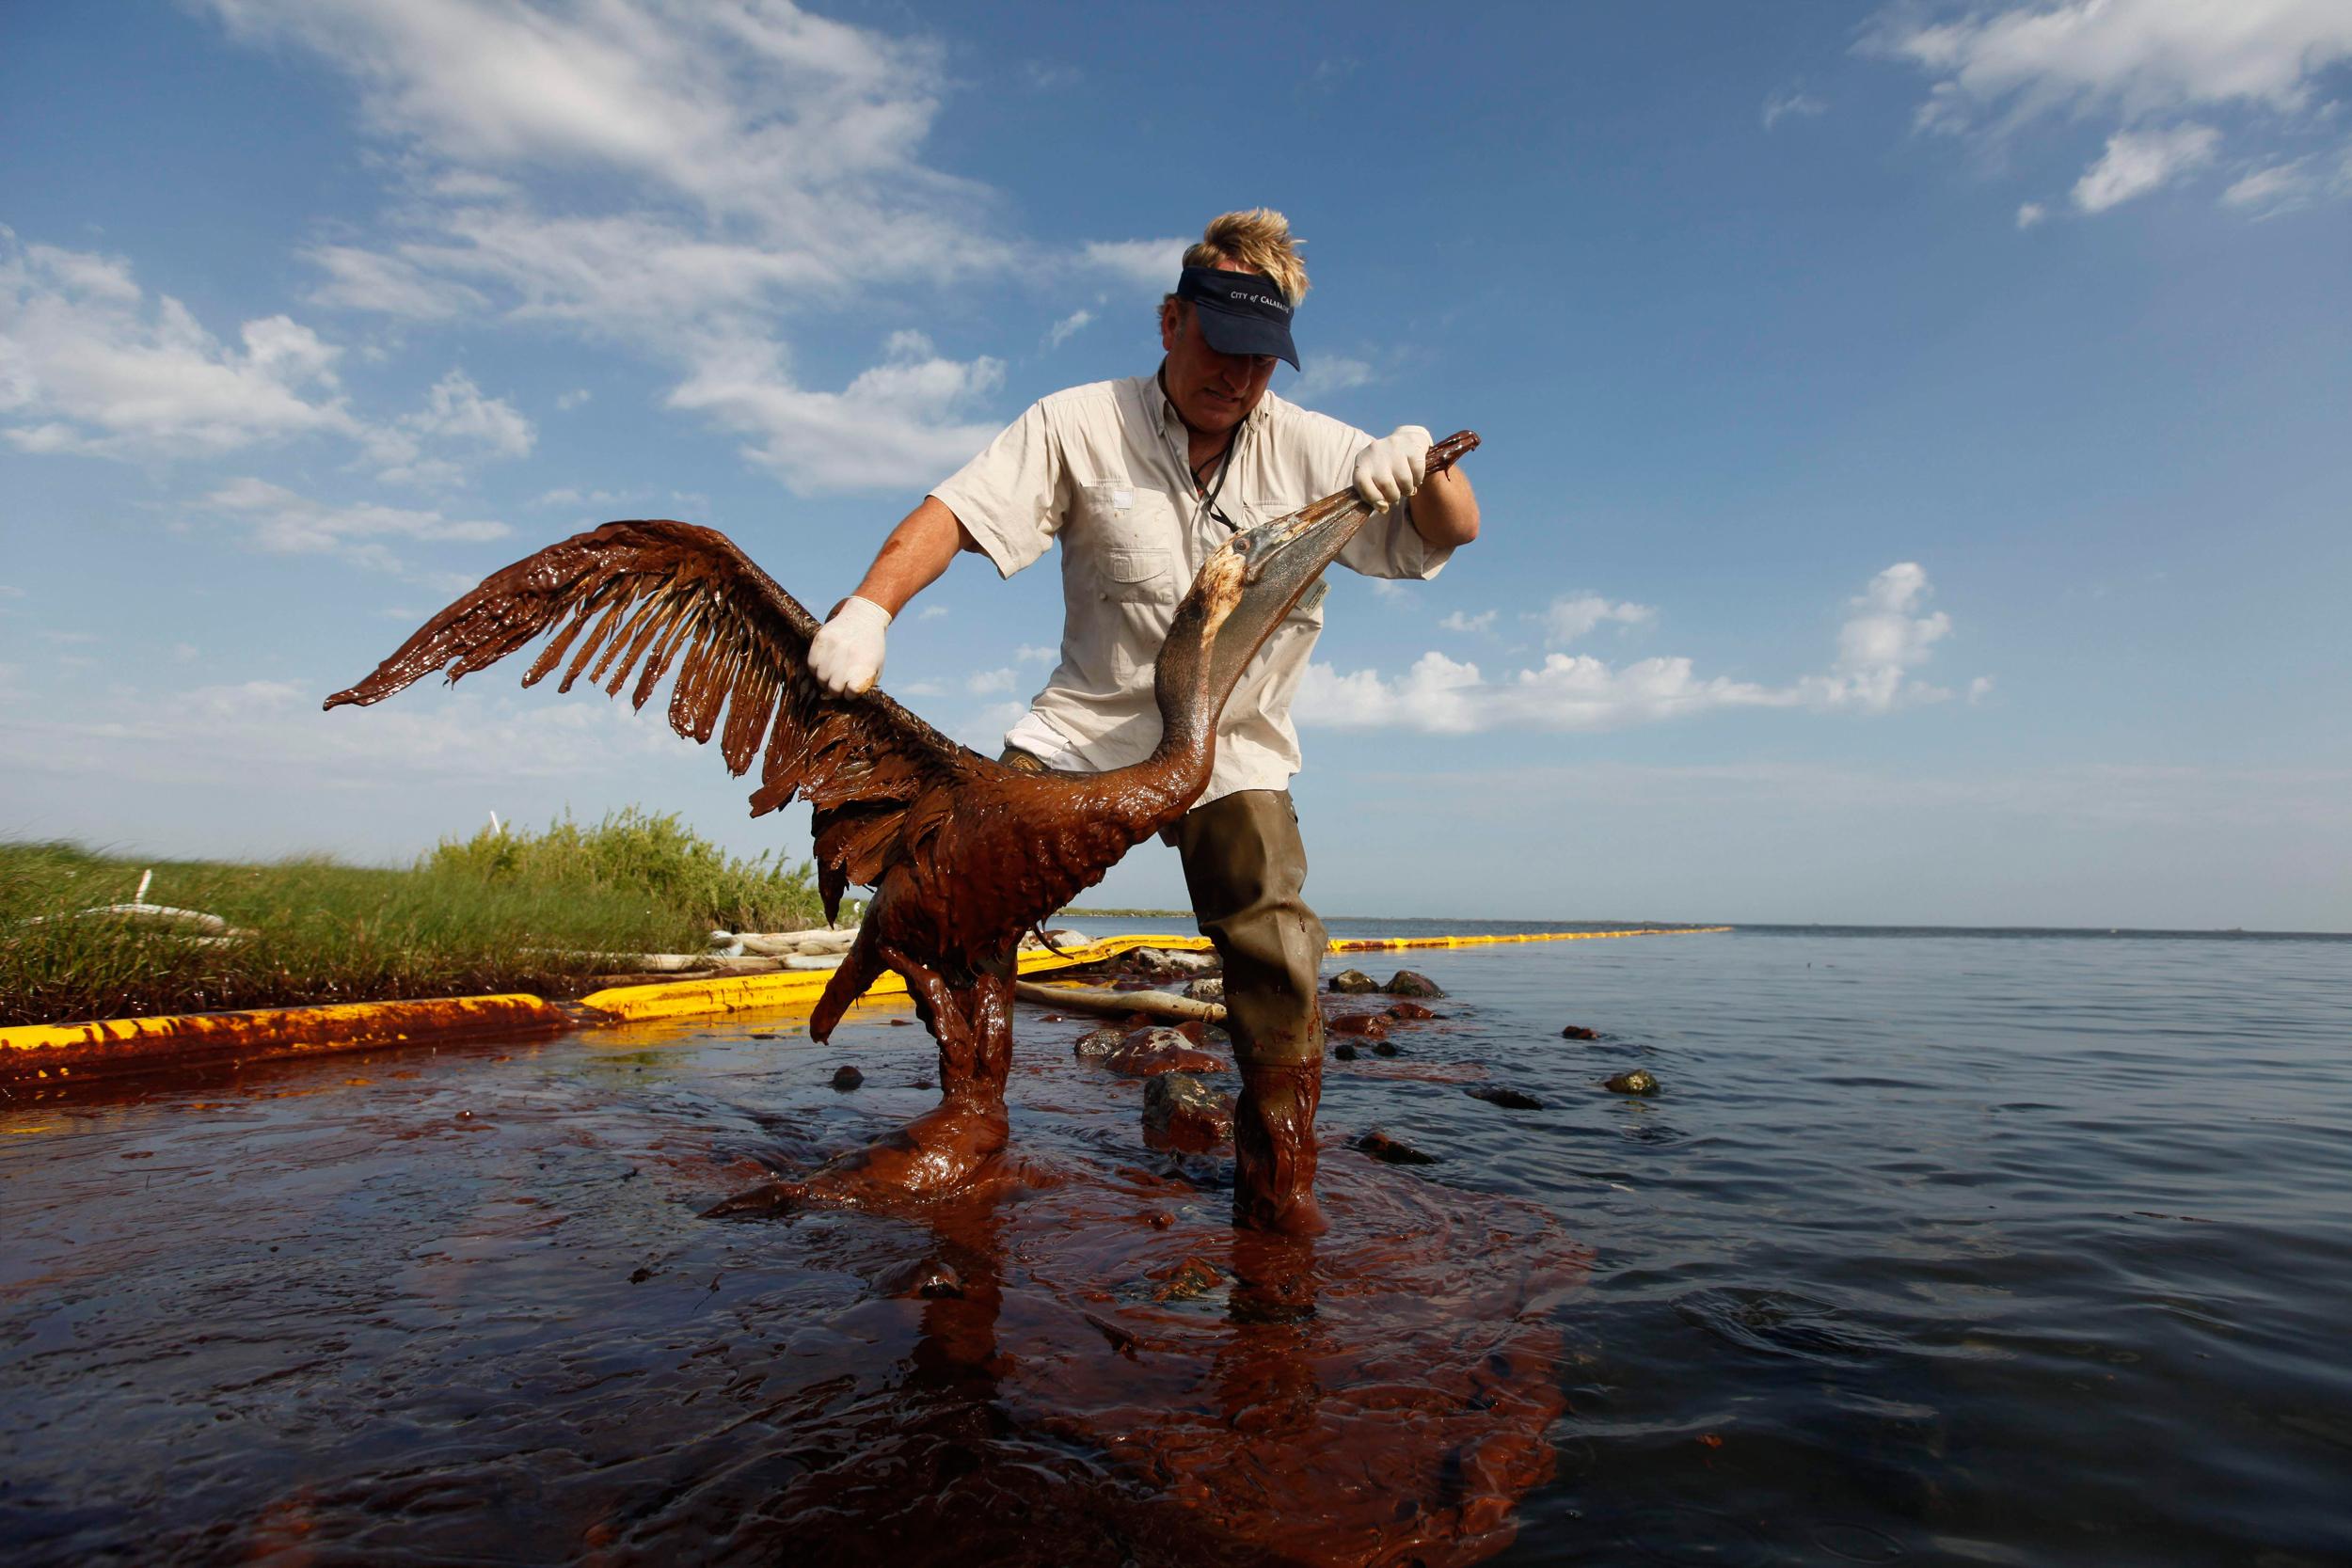 Timeline: BP Settlement Ends 5-Year Legal Saga